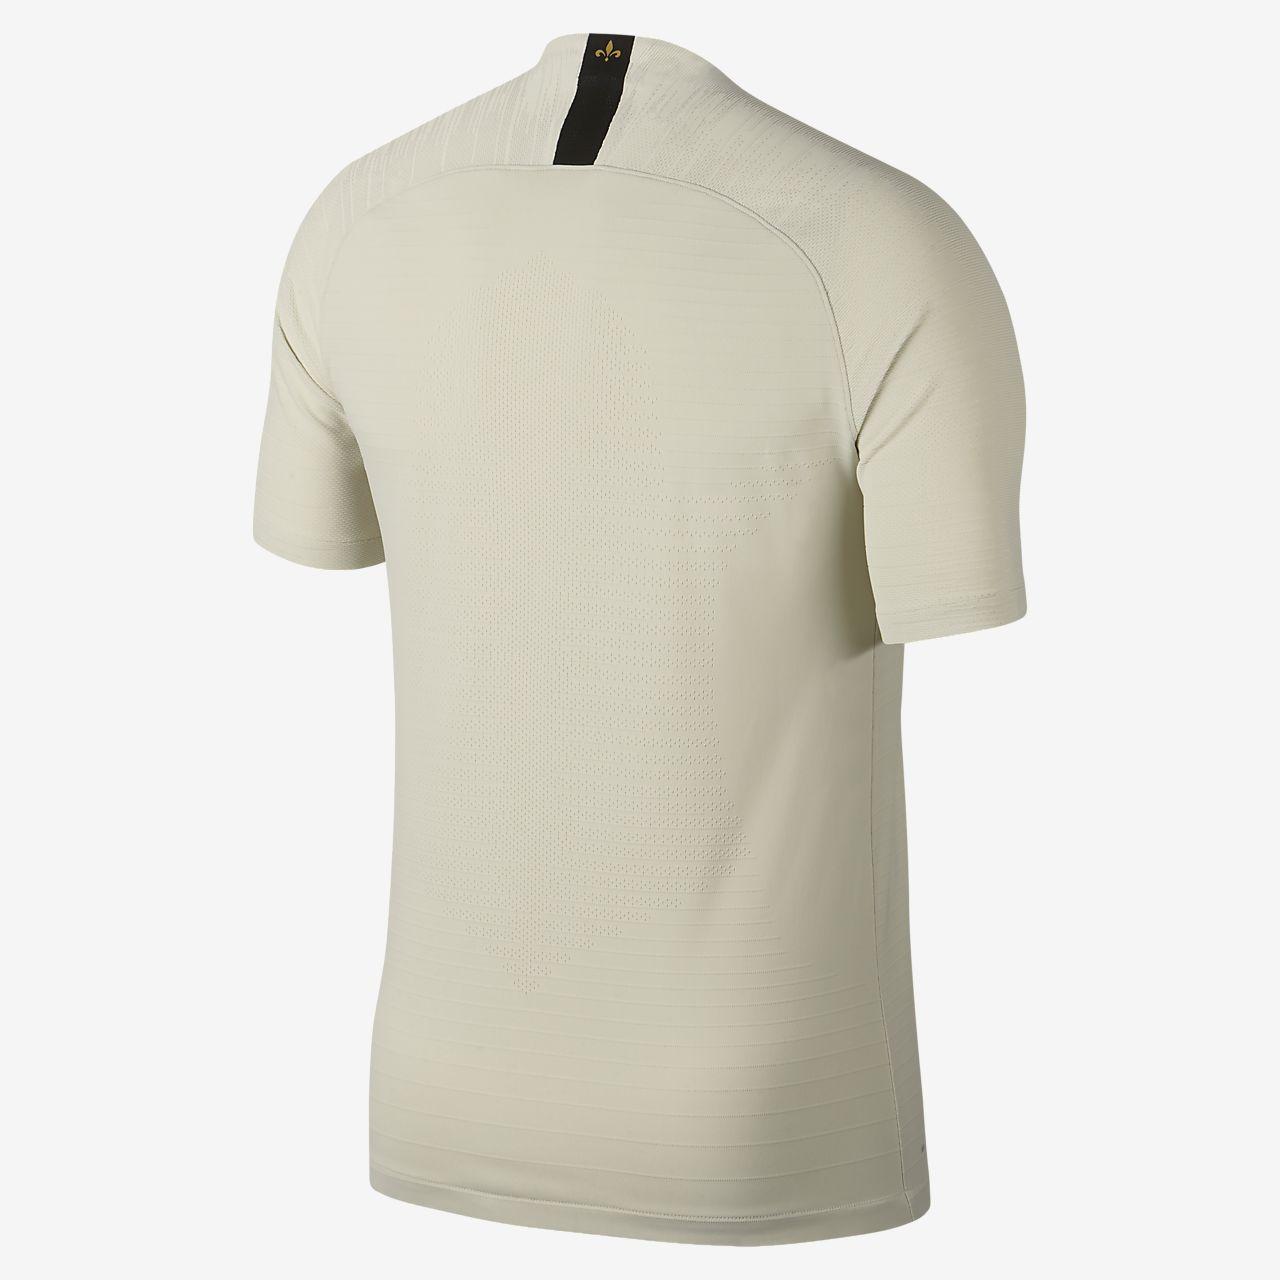 c9a14a1c62ff51 2018 19 Paris Saint-Germain Vapor Match Away Men s Football Shirt ...